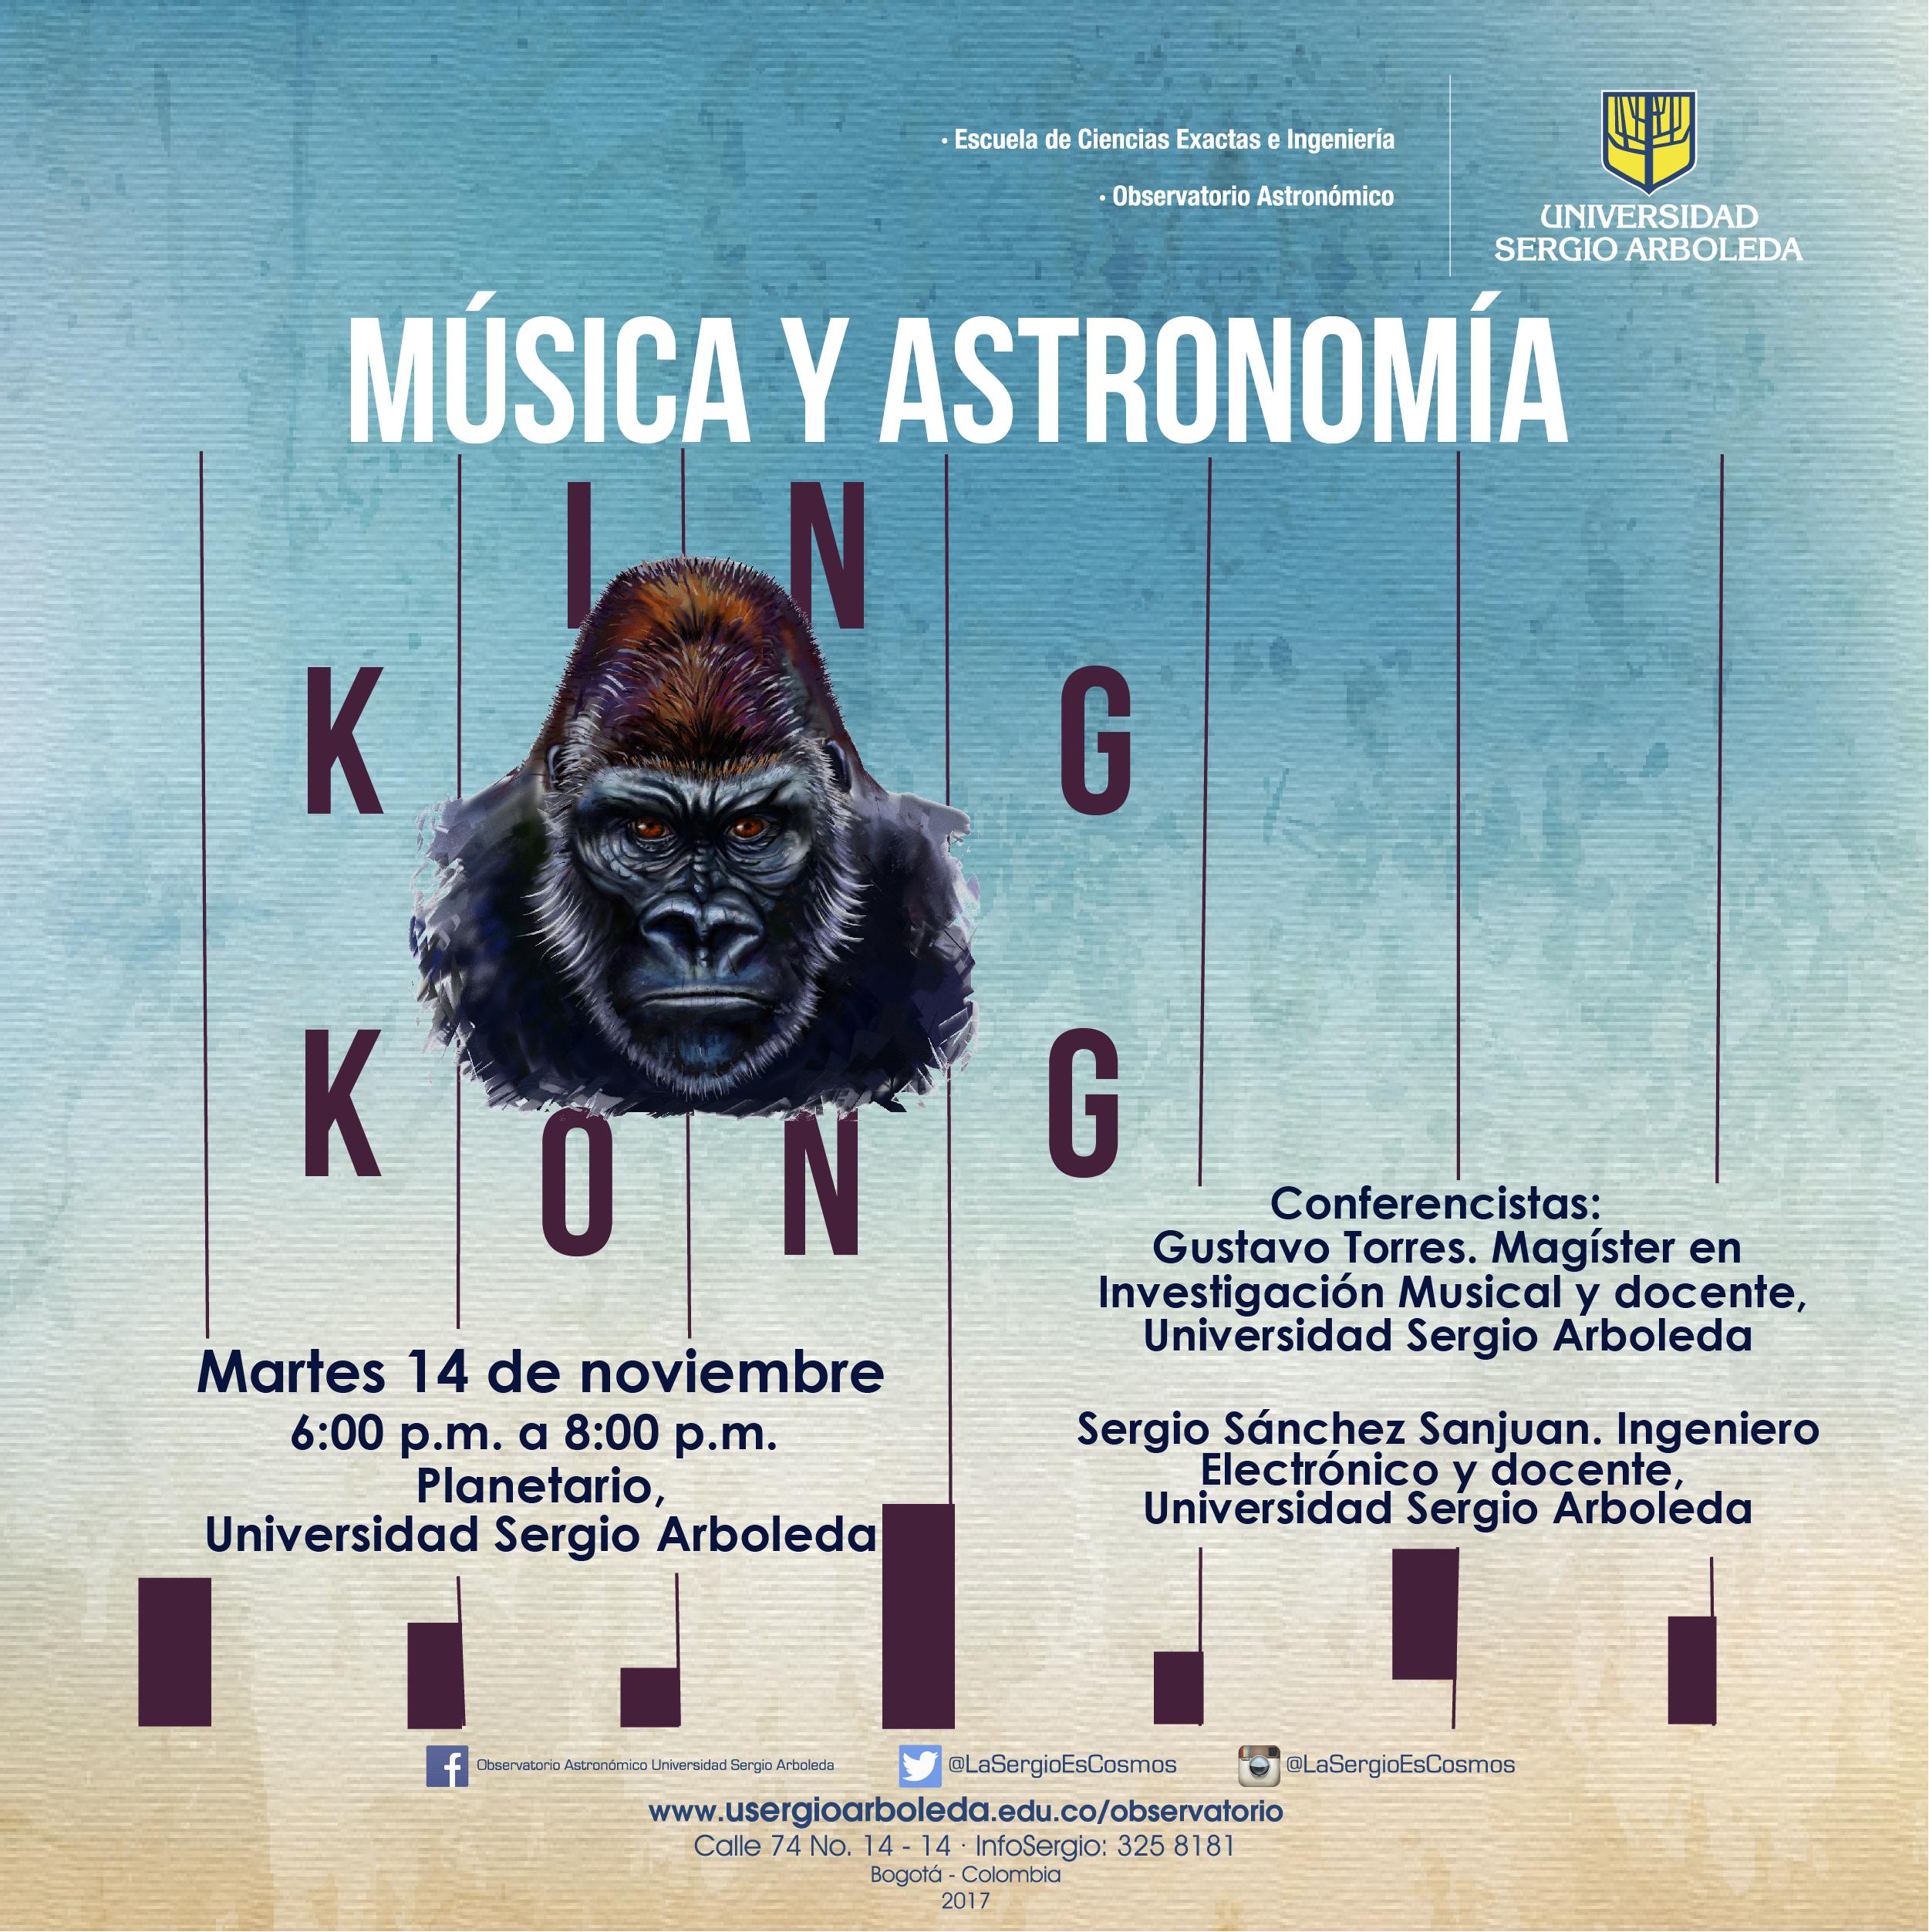 King_kong-01